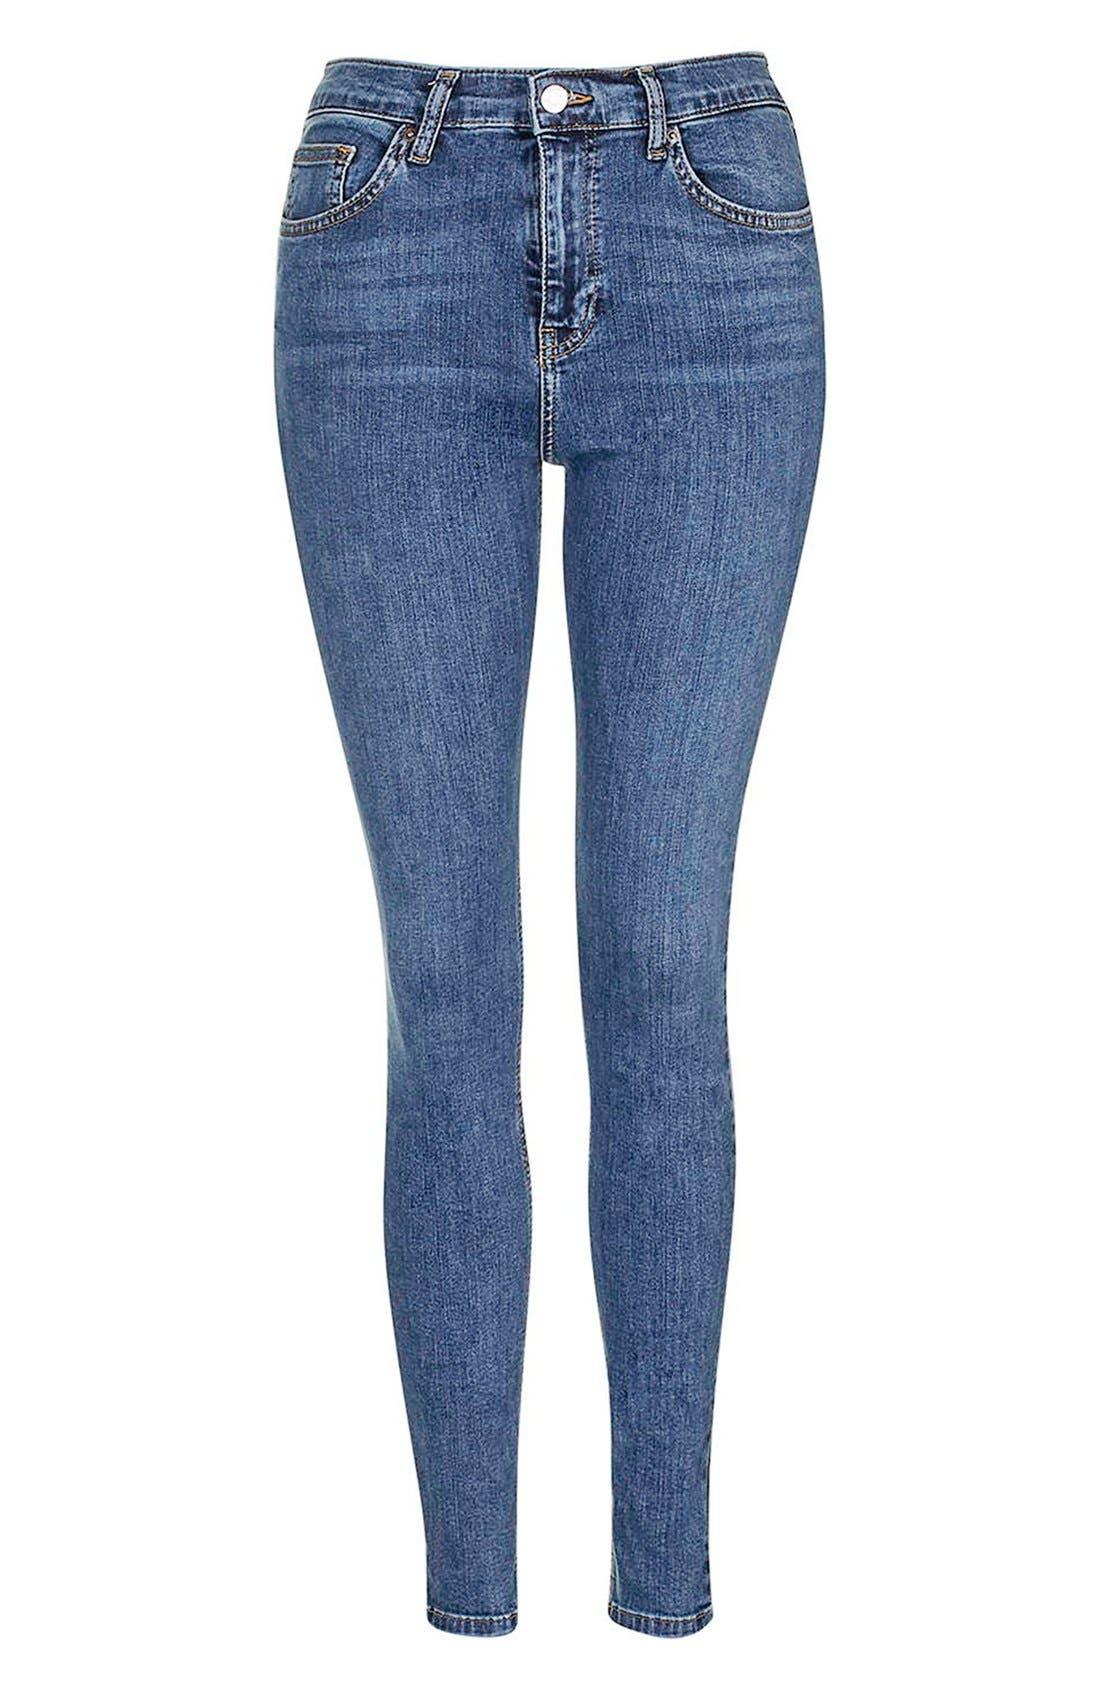 'Jamie' High Rise Ankle Skinny Jeans,                             Alternate thumbnail 2, color,                             MID DENIM